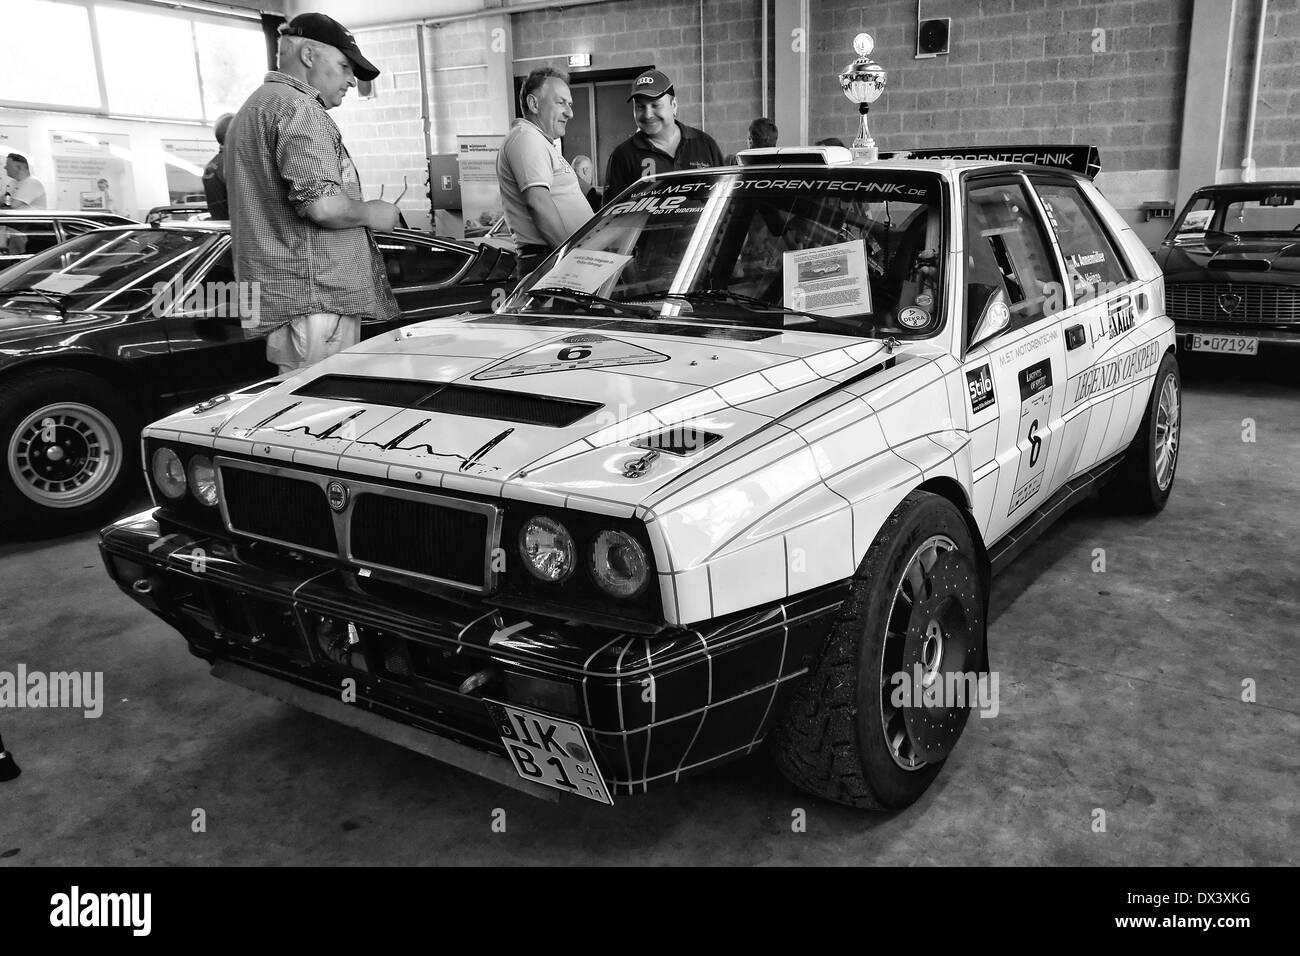 sport auto lancia delta hf integrale 8v stockfoto, bild: 67698948